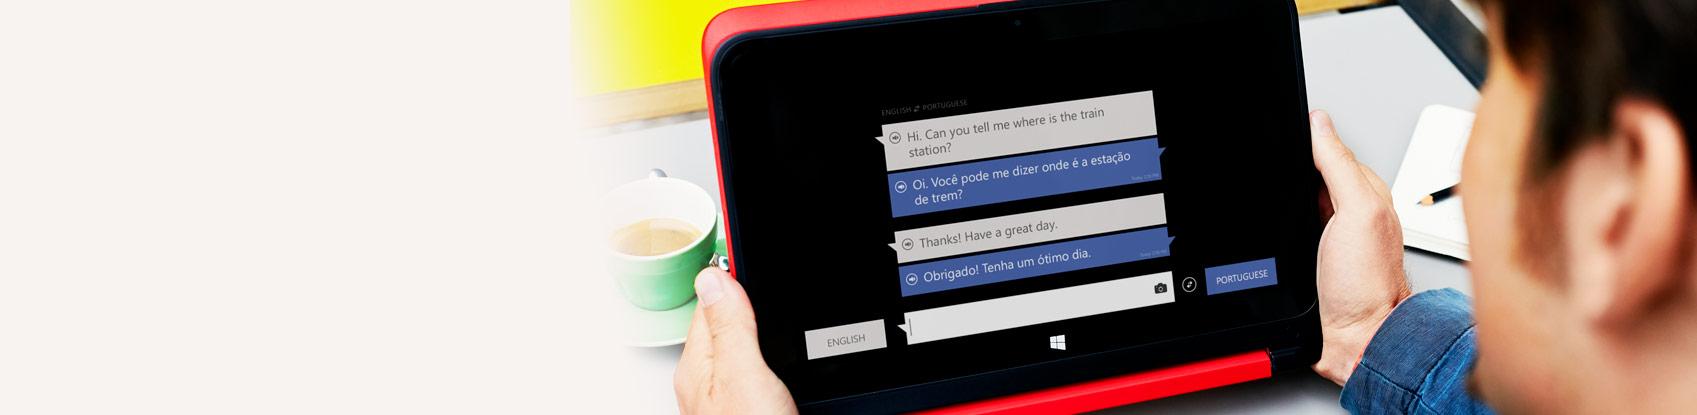 Microsoft Translator for Windows